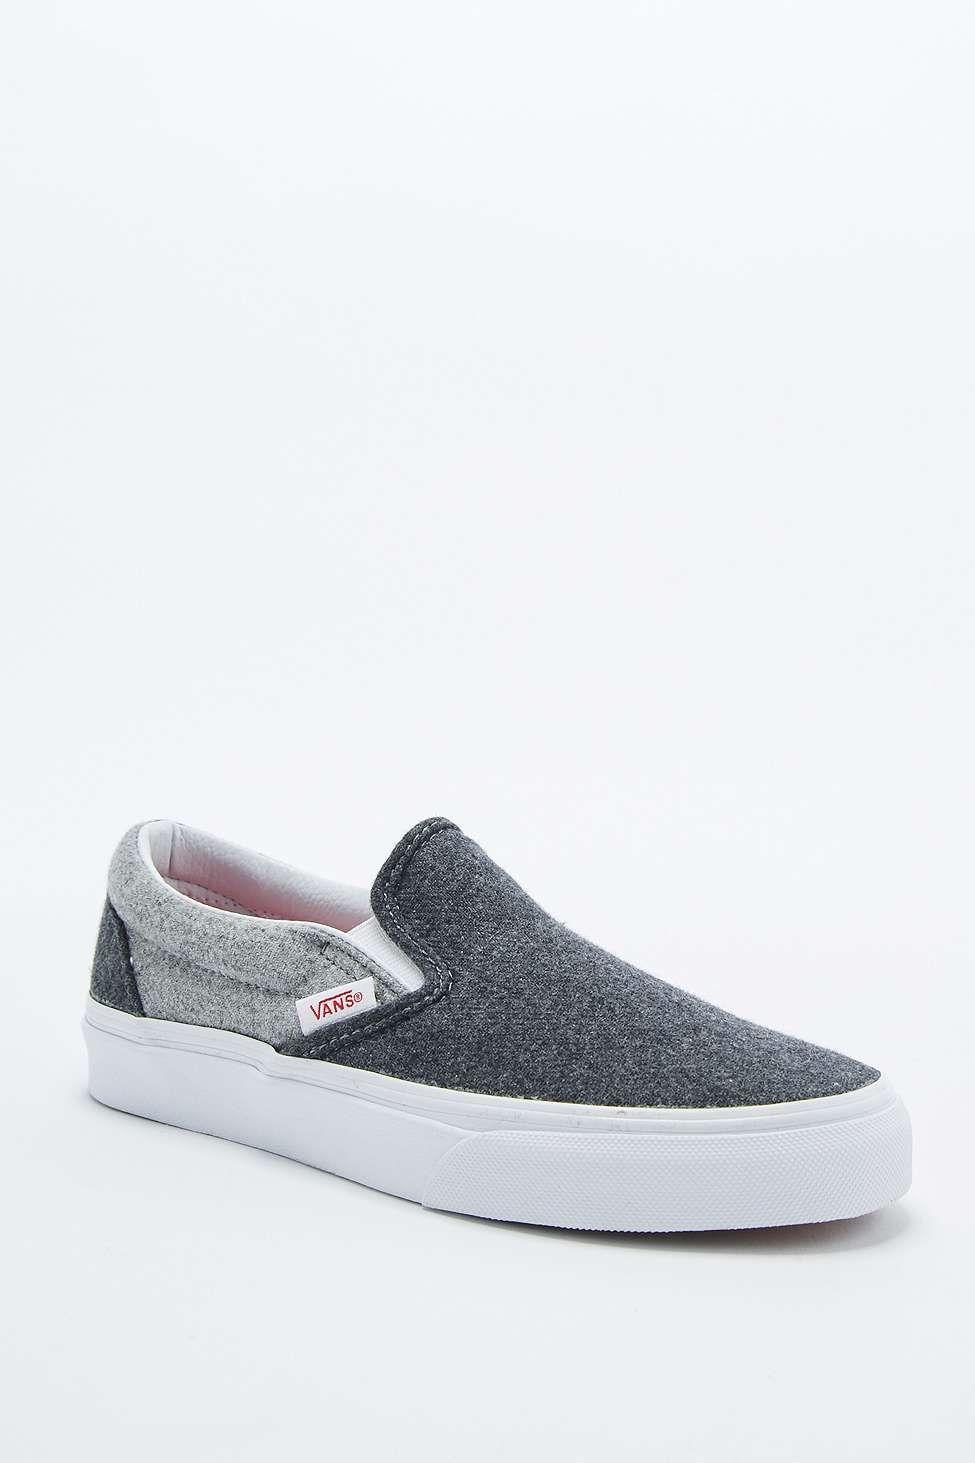 vans classic grey & white slip on shoe